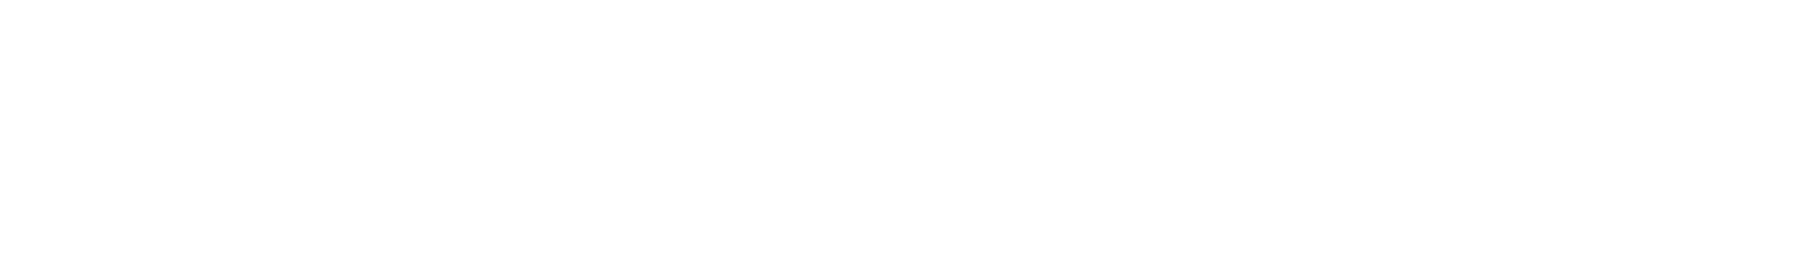 perc 1 6